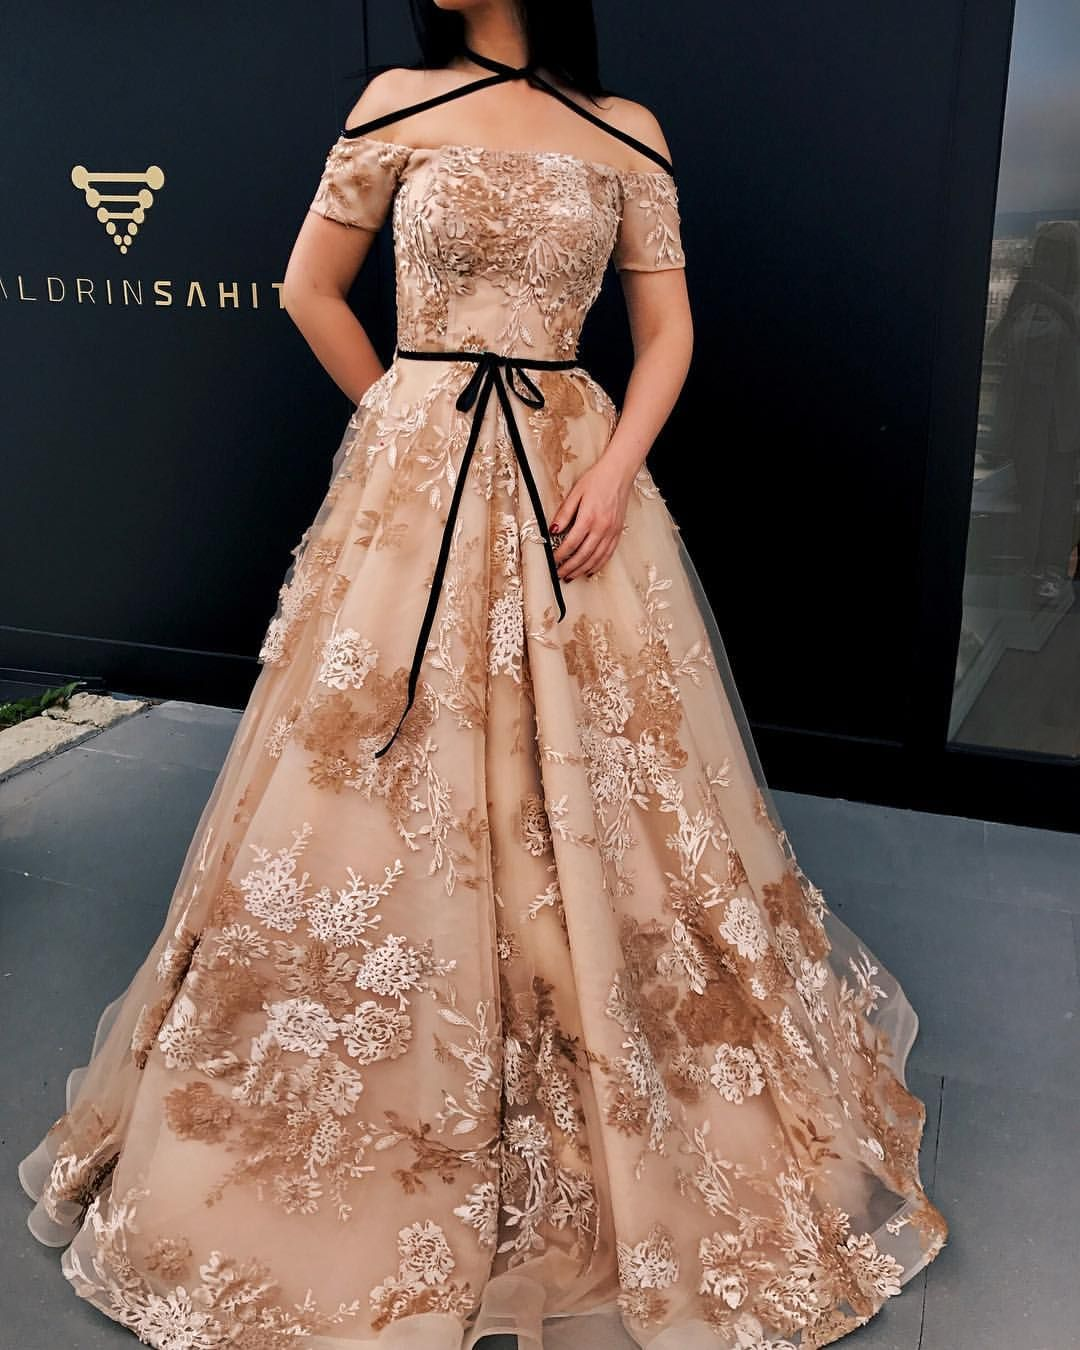 valdrin sahiti dresses reviews